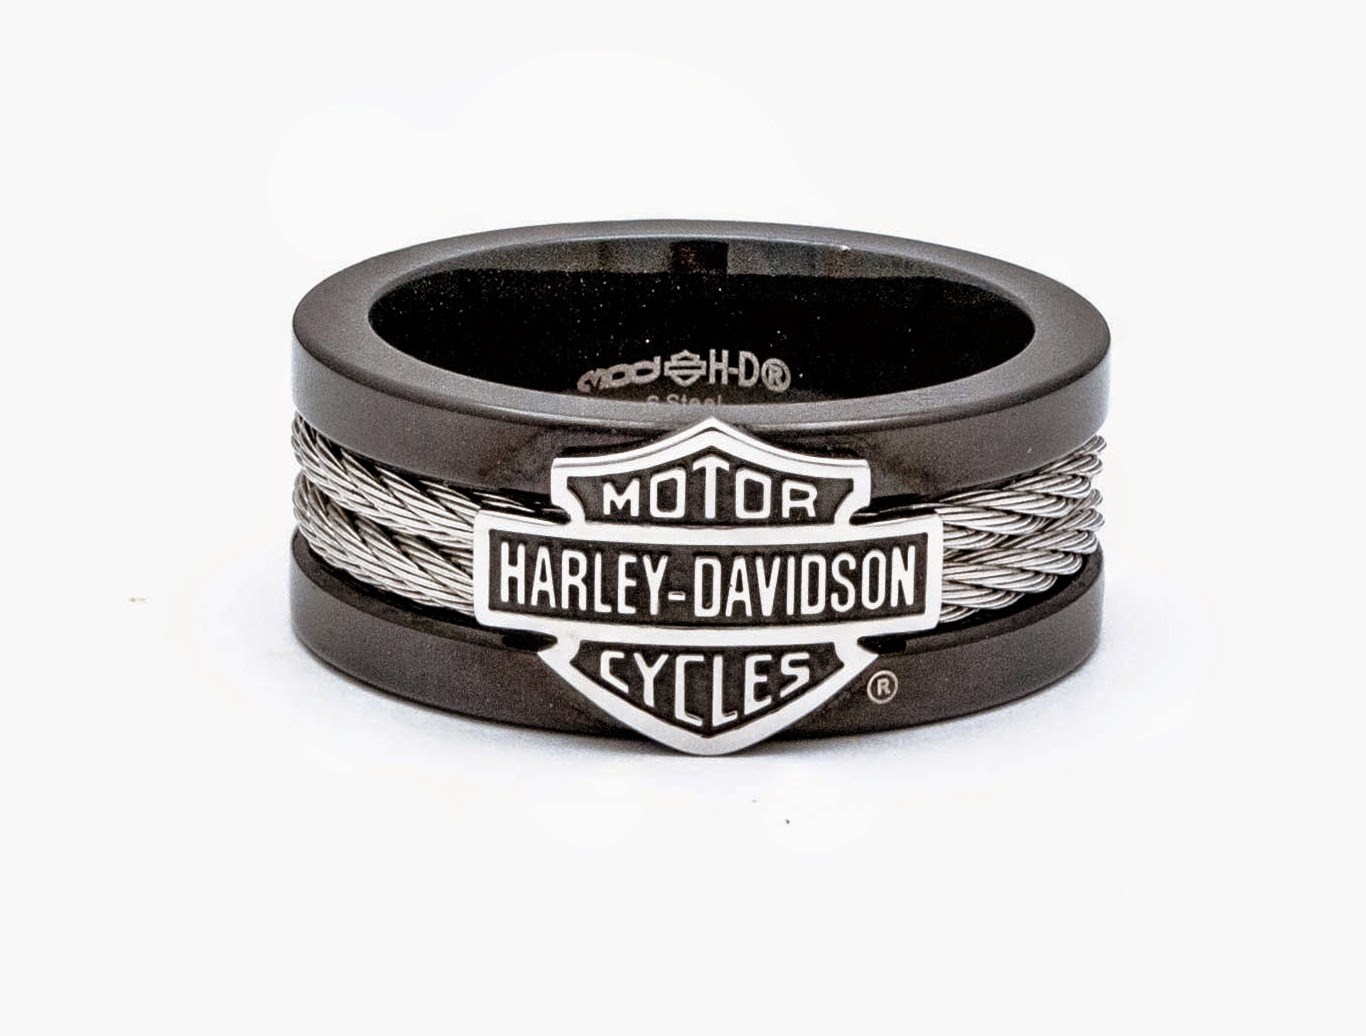 harley davidson mens wedding rings harley davidson wedding bands harley davidson mens wedding rings photos